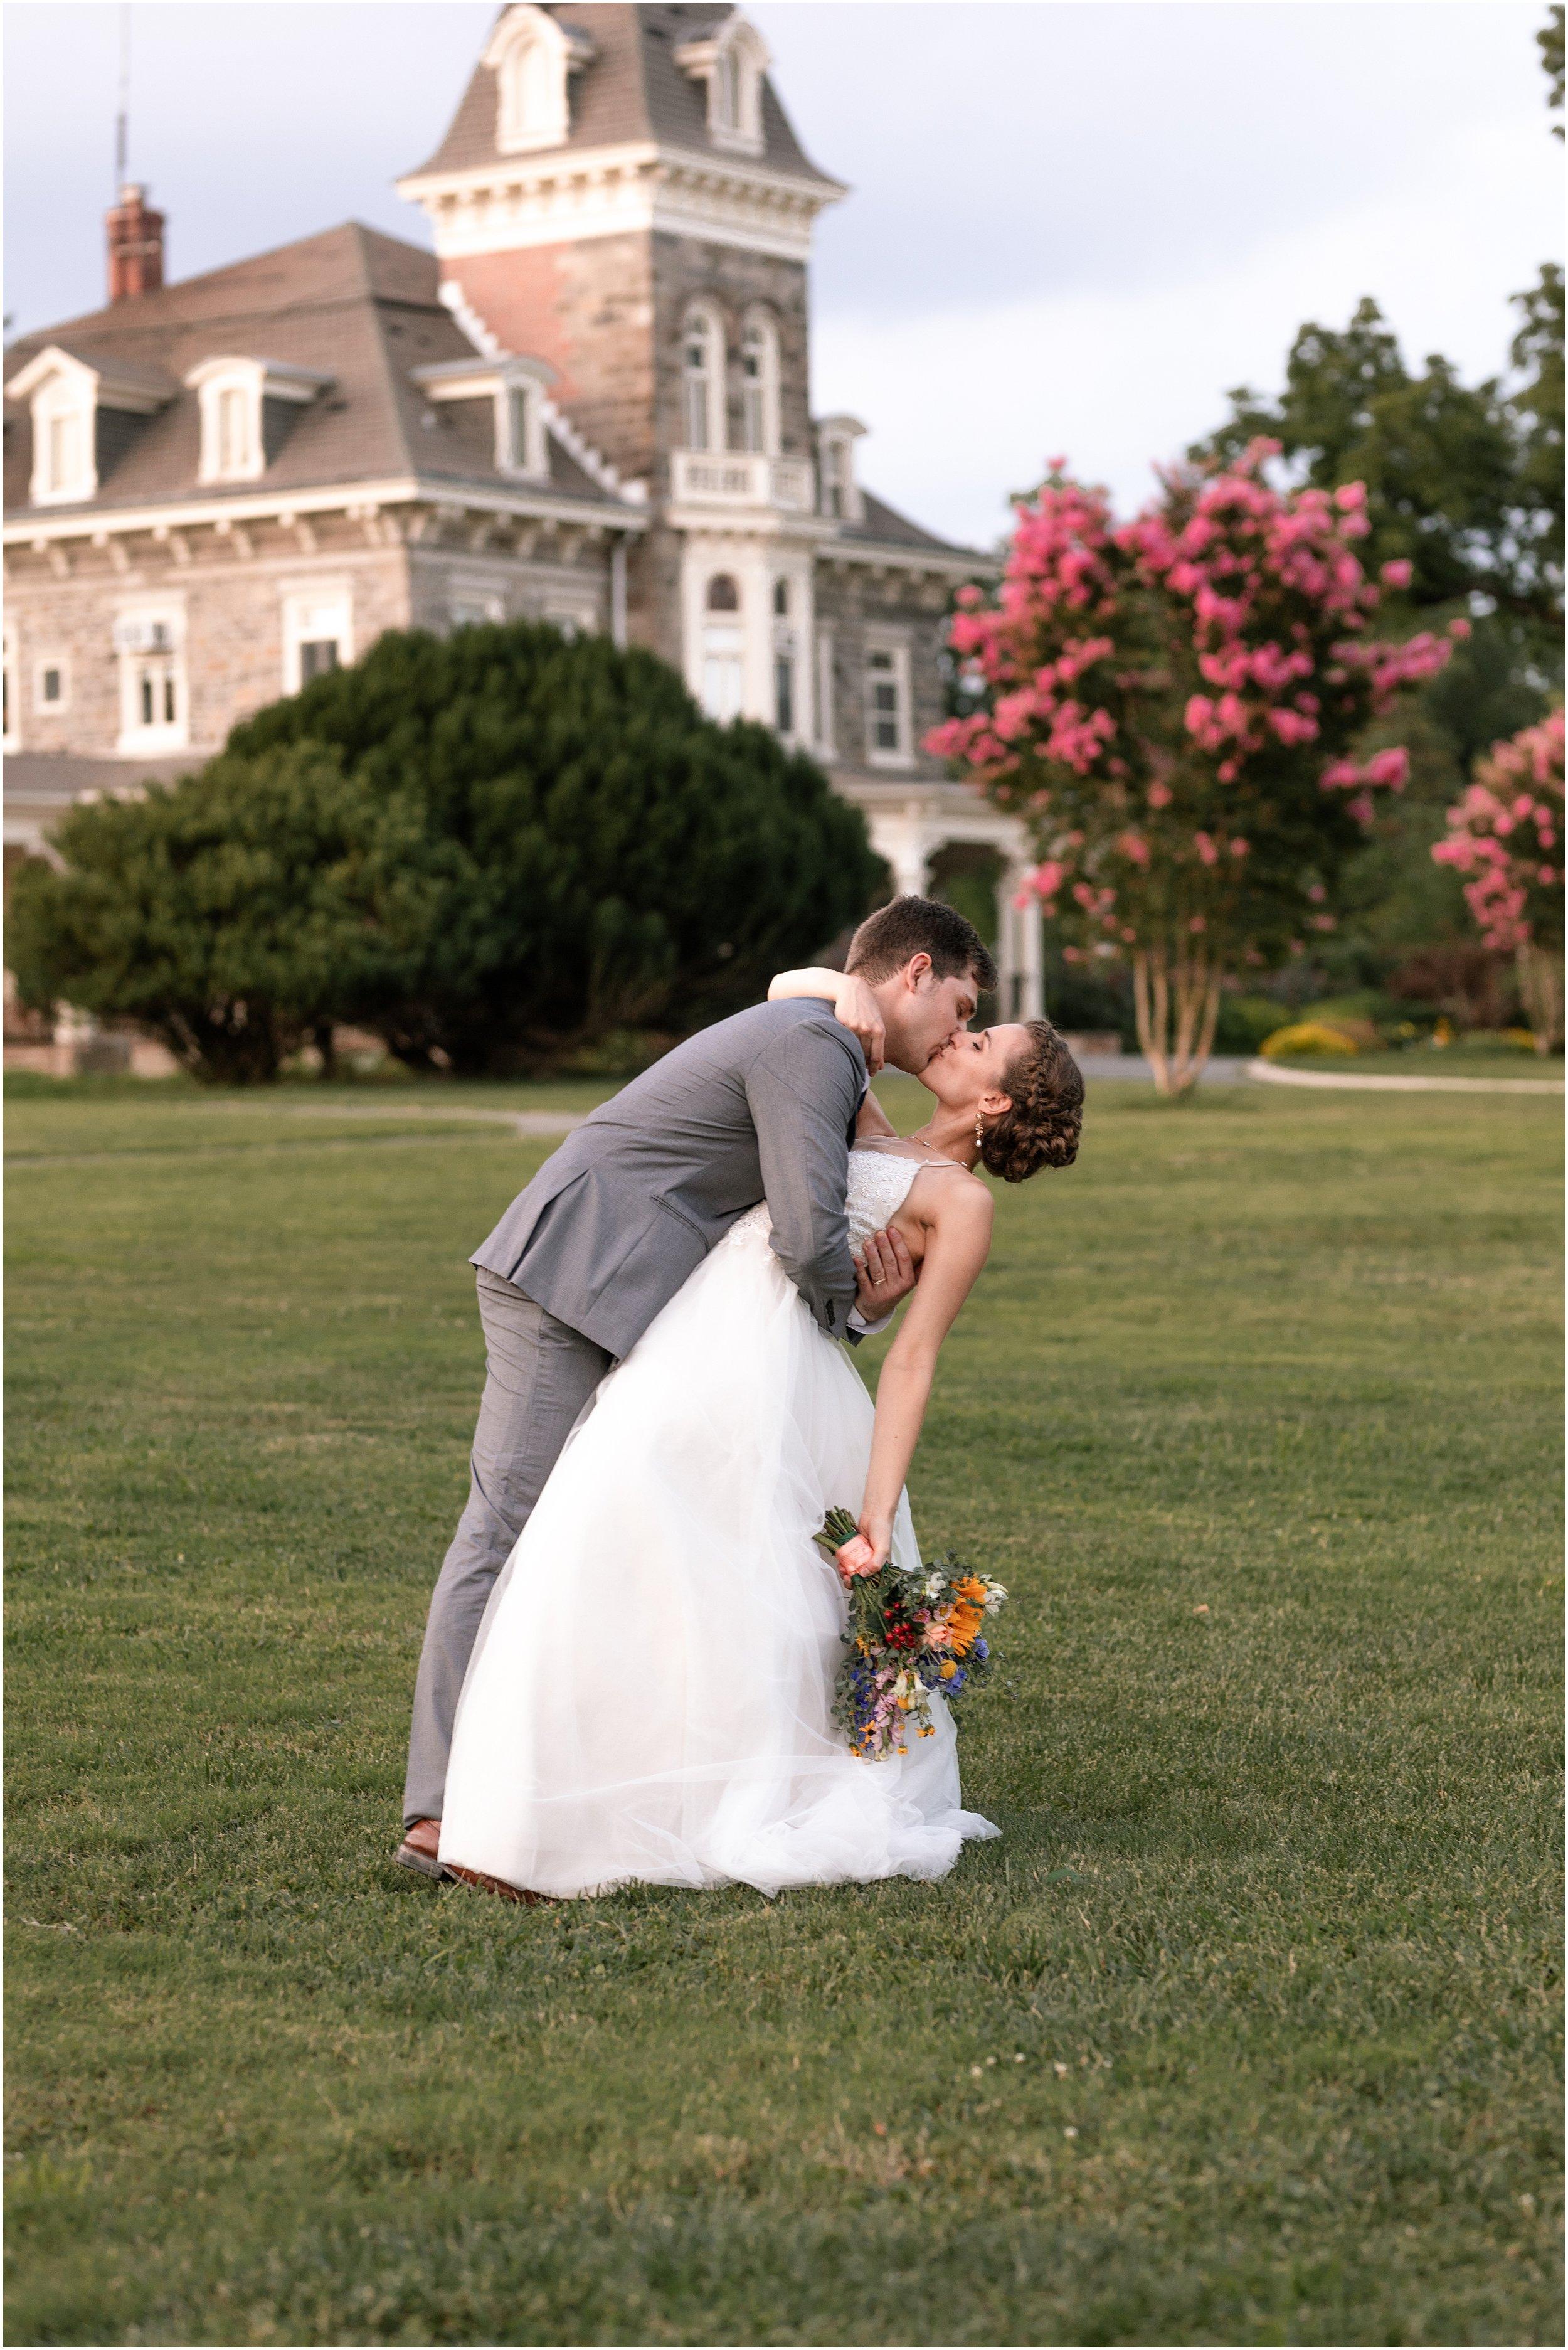 hannah leigh photography Cylburn Arboretum Wedding Baltimore, MD_3472.jpg